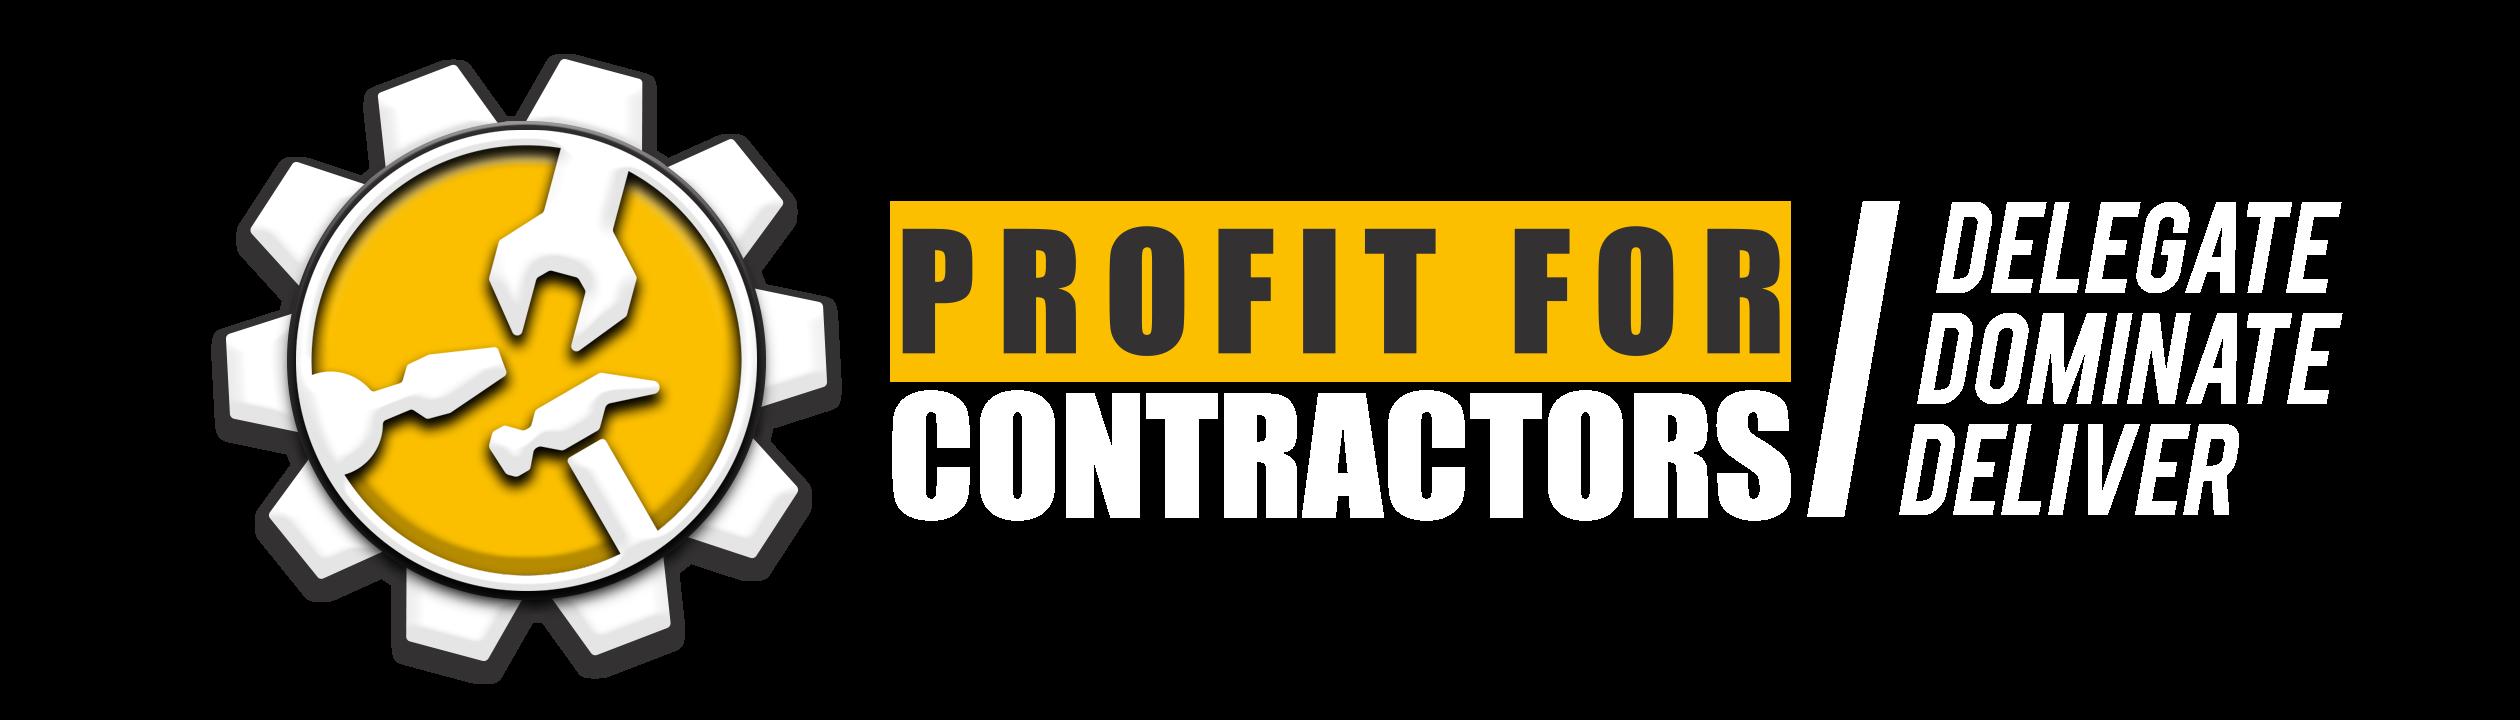 Profit For Contractors